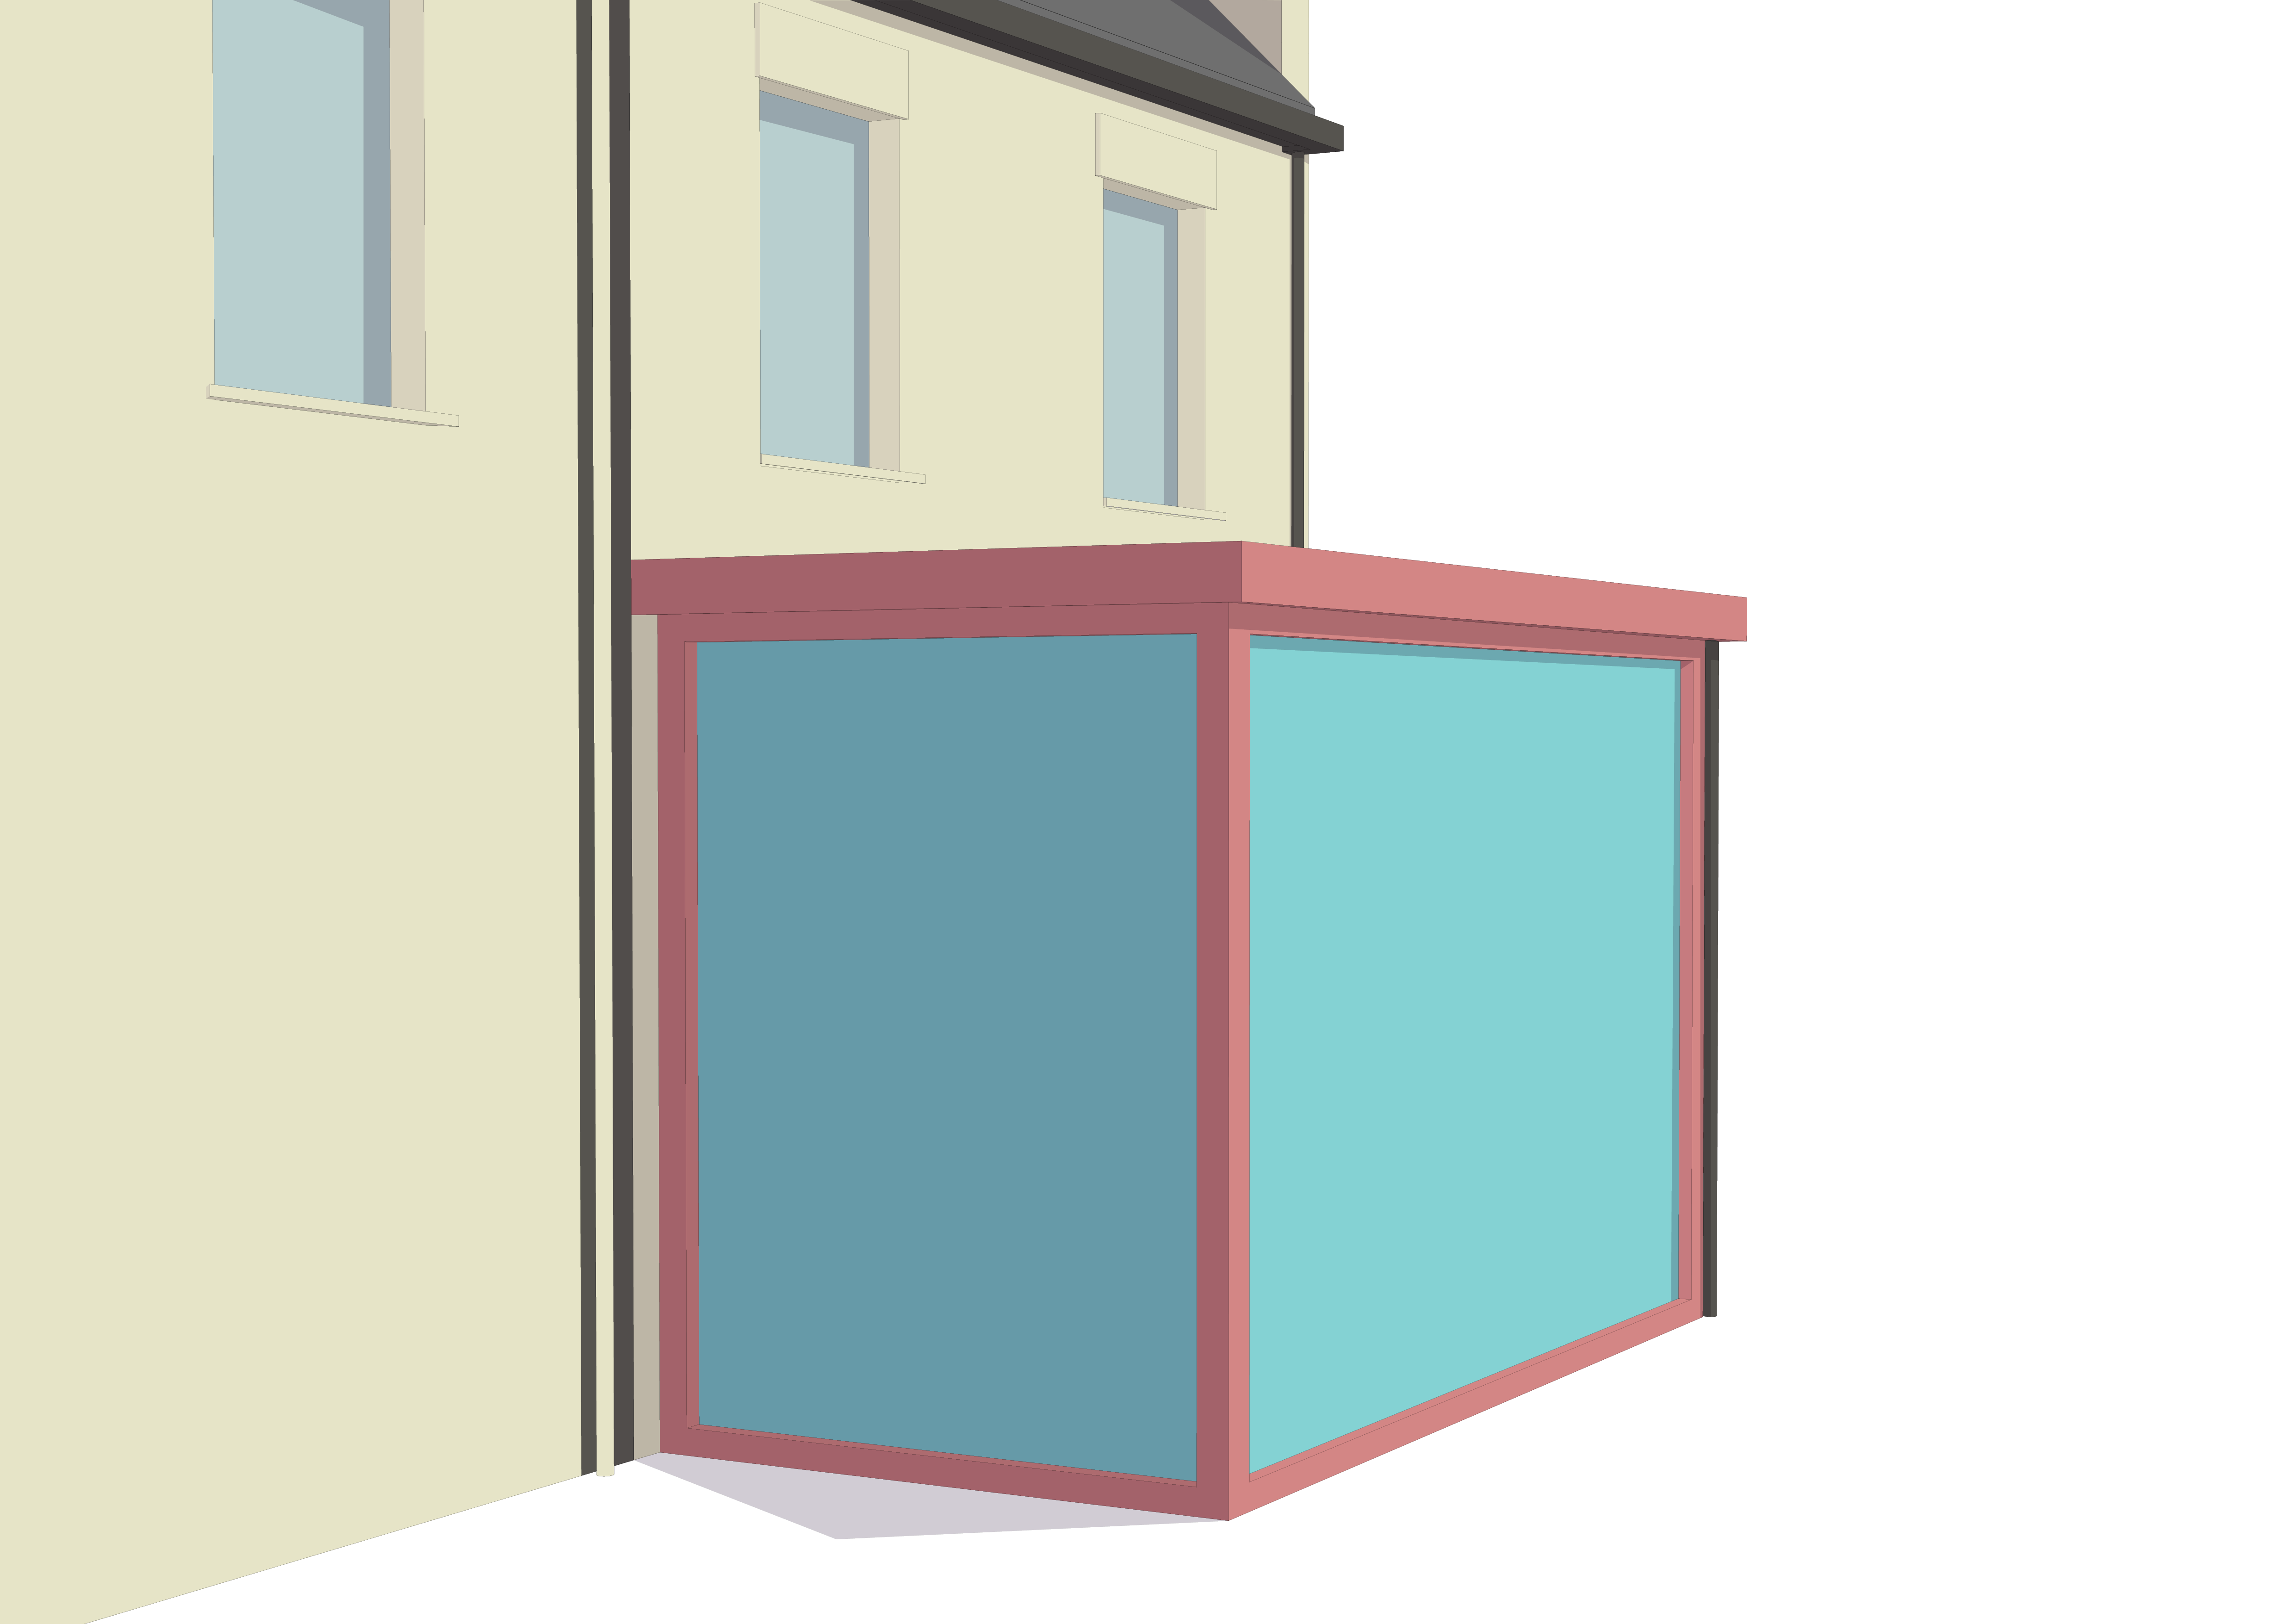 A modern single storey house extension